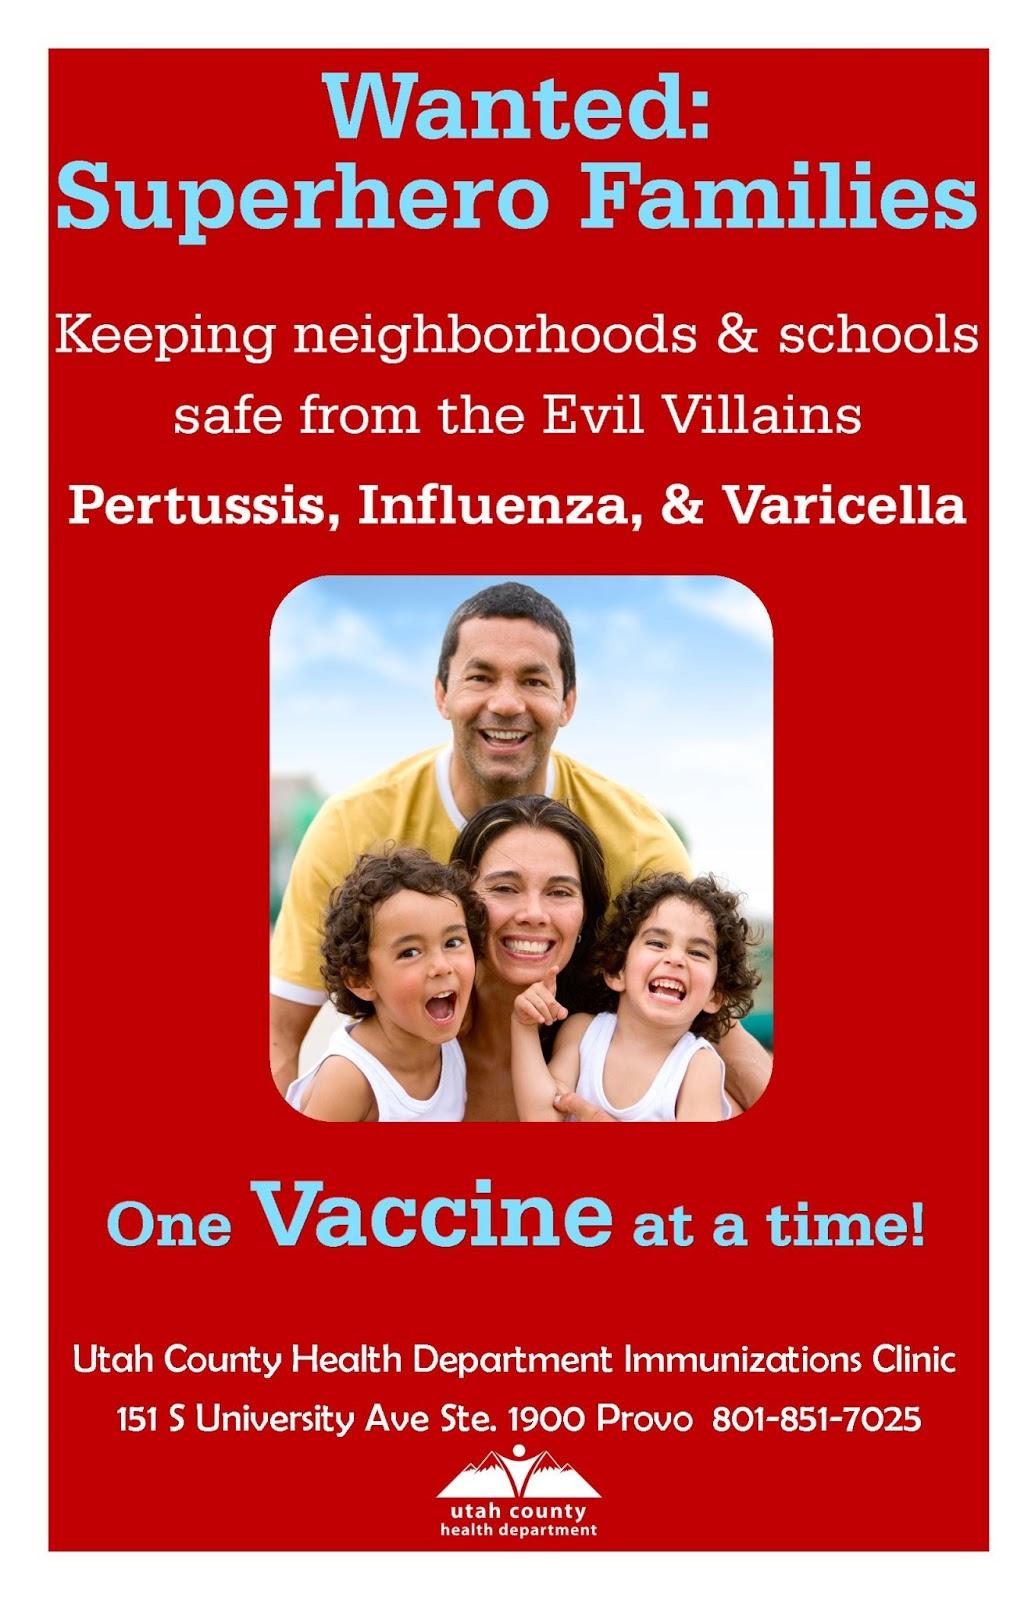 Utah County Health Department Immunization Clinics